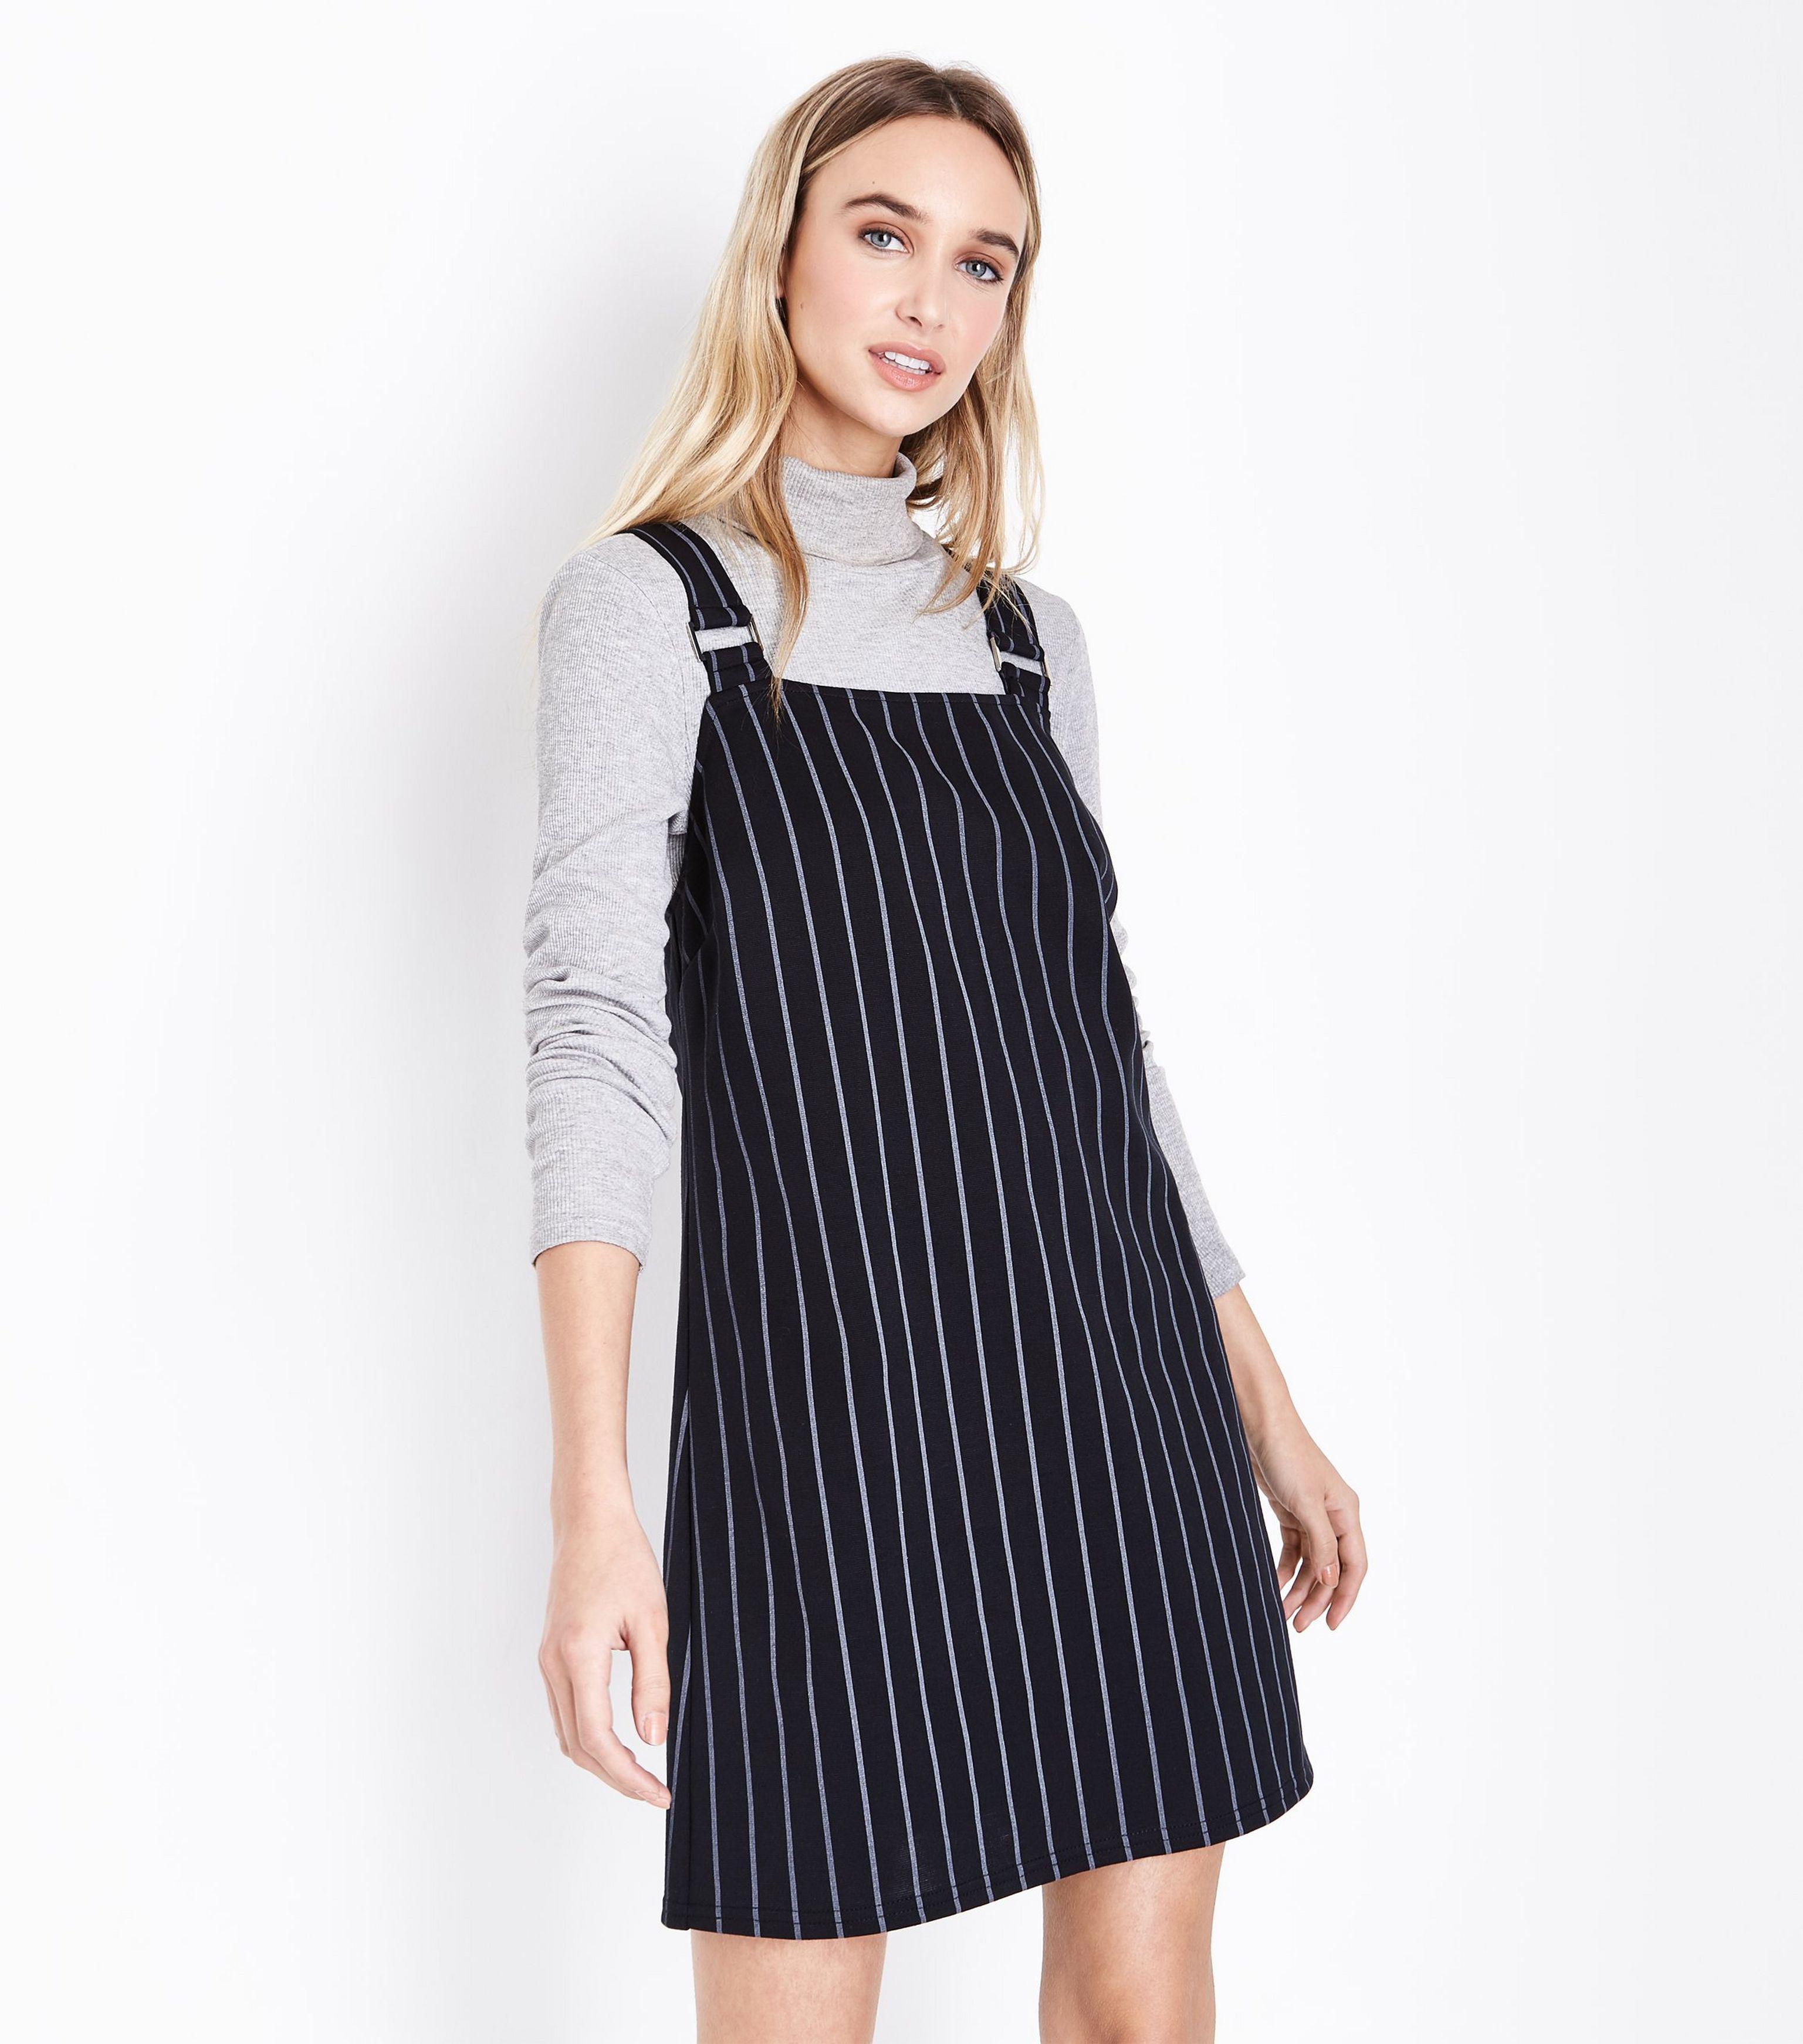 a95689c0340 New Look Black Pinstripe Pinafore Dress in Black - Lyst